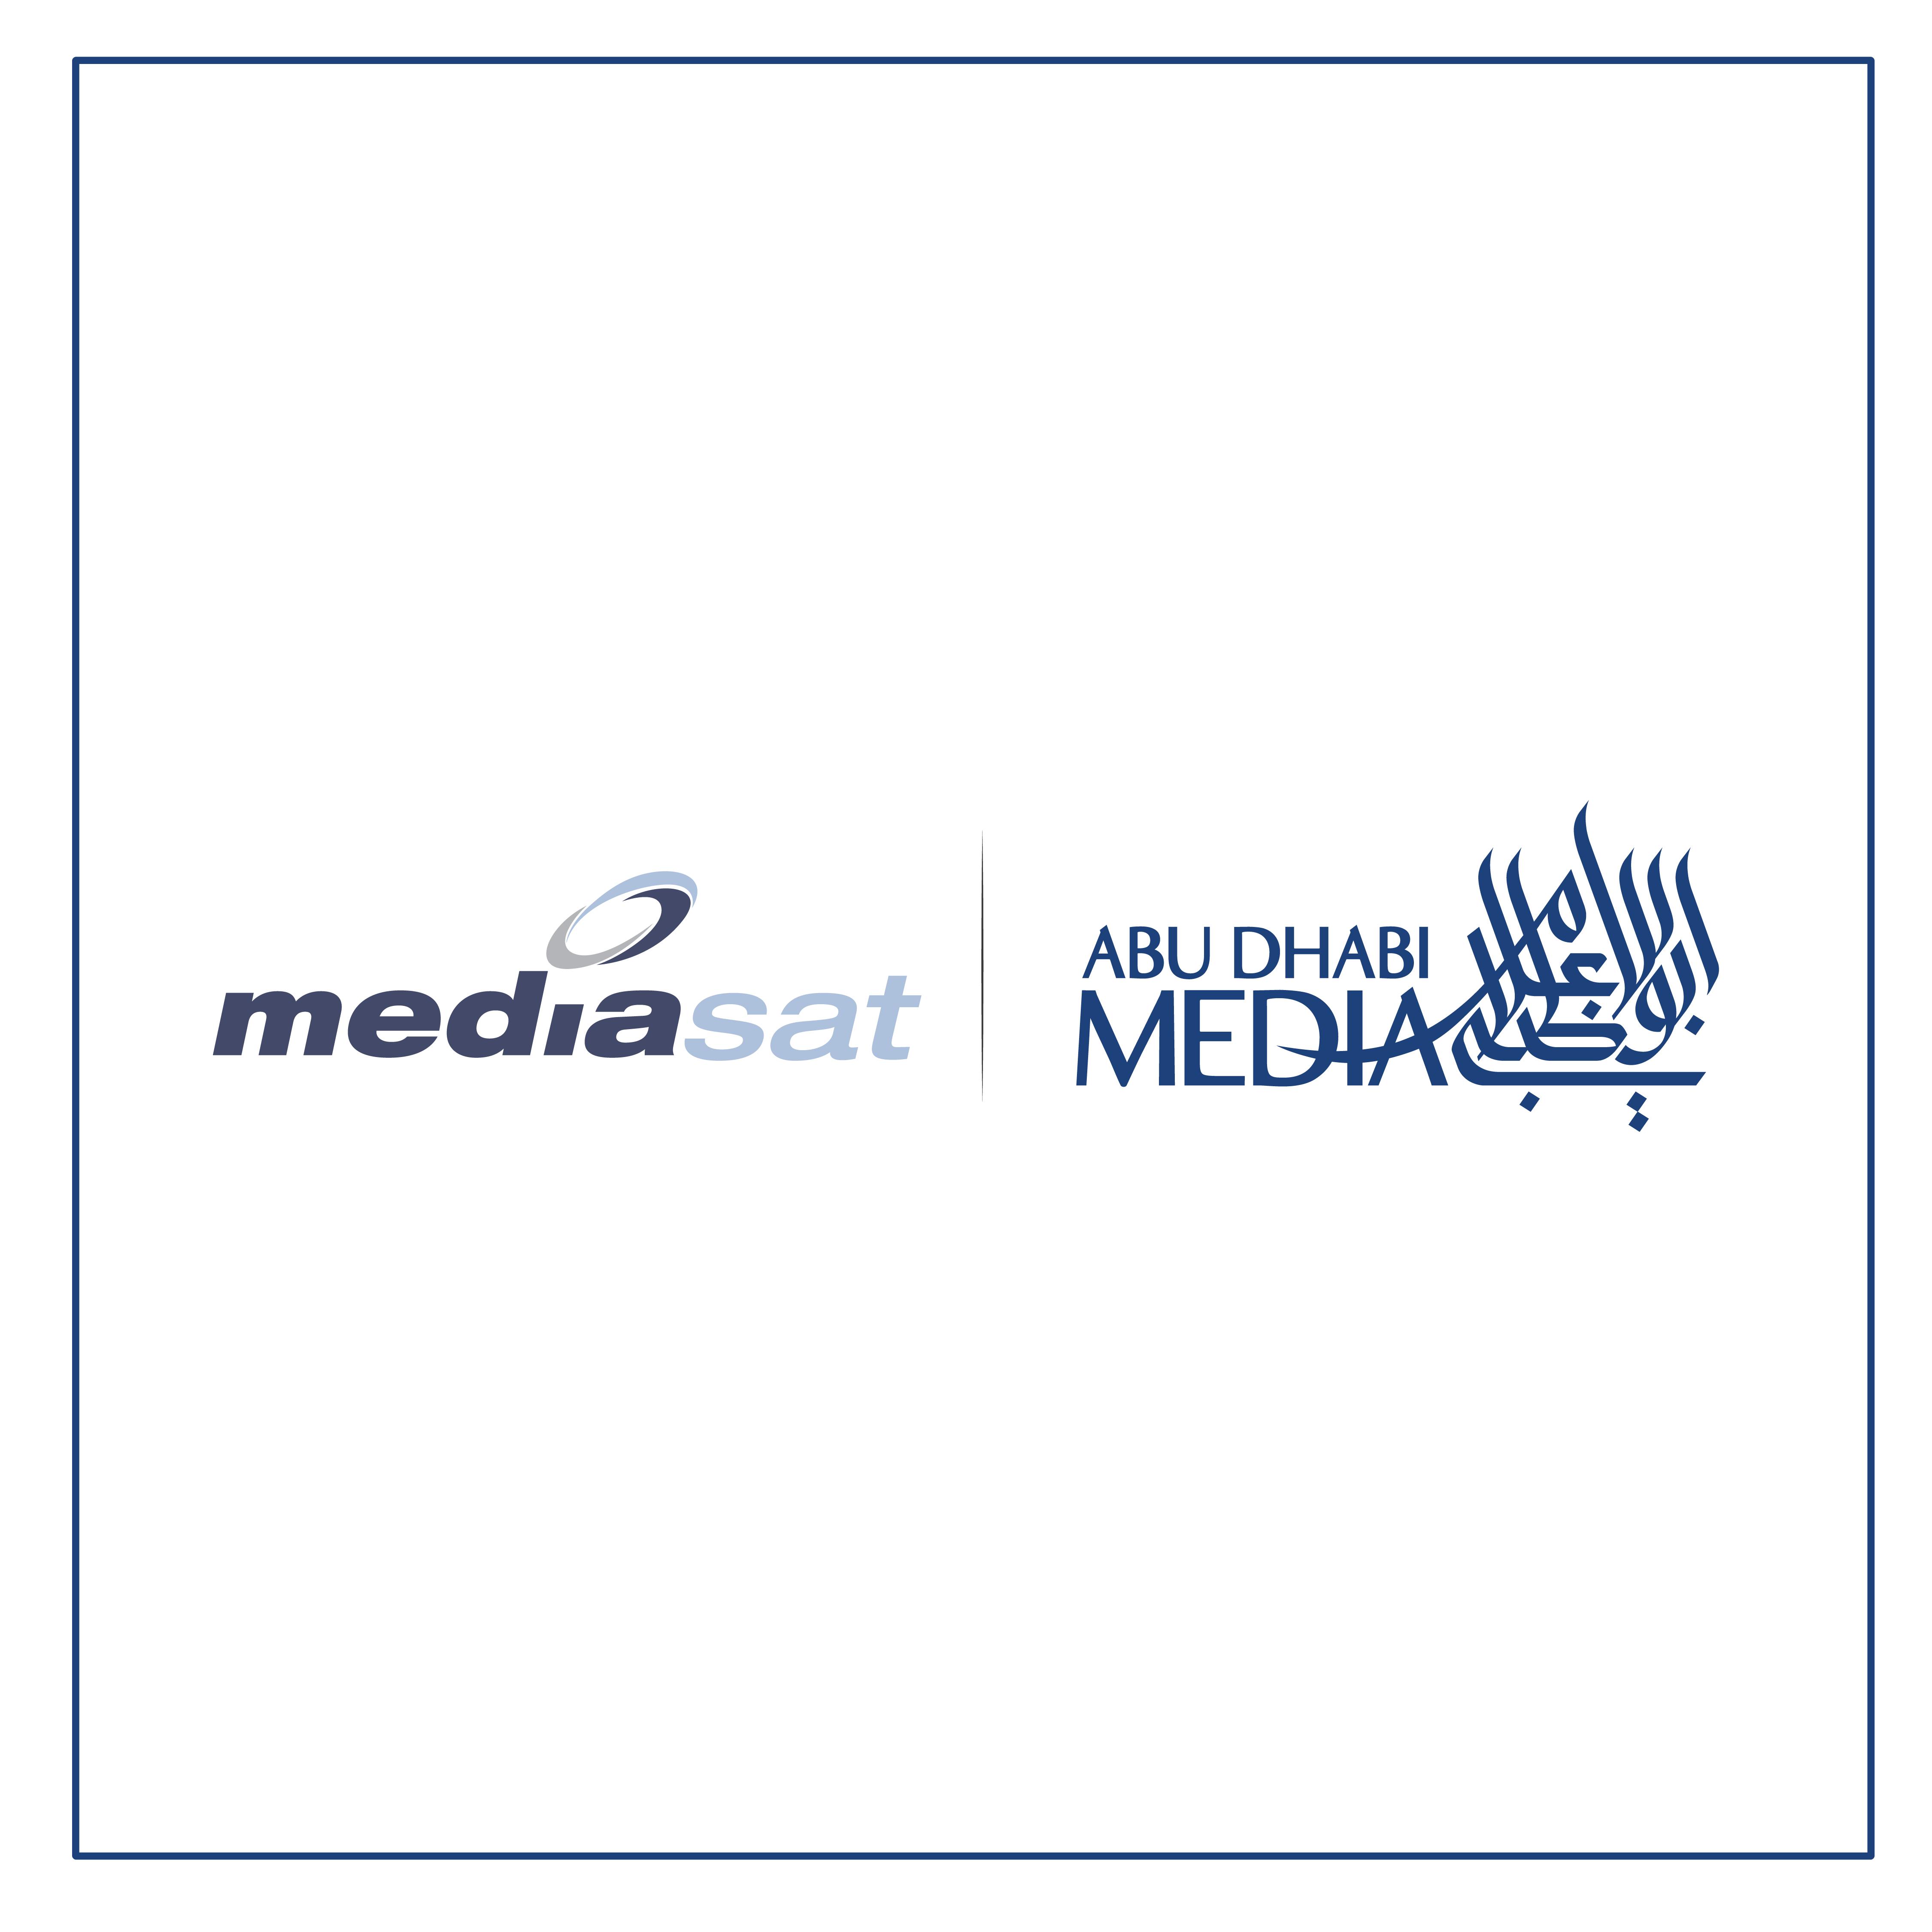 -abu-dhabi-media-appoints-choueiri-groups-media-sat-as-its-exclusive-advertising-media-representative